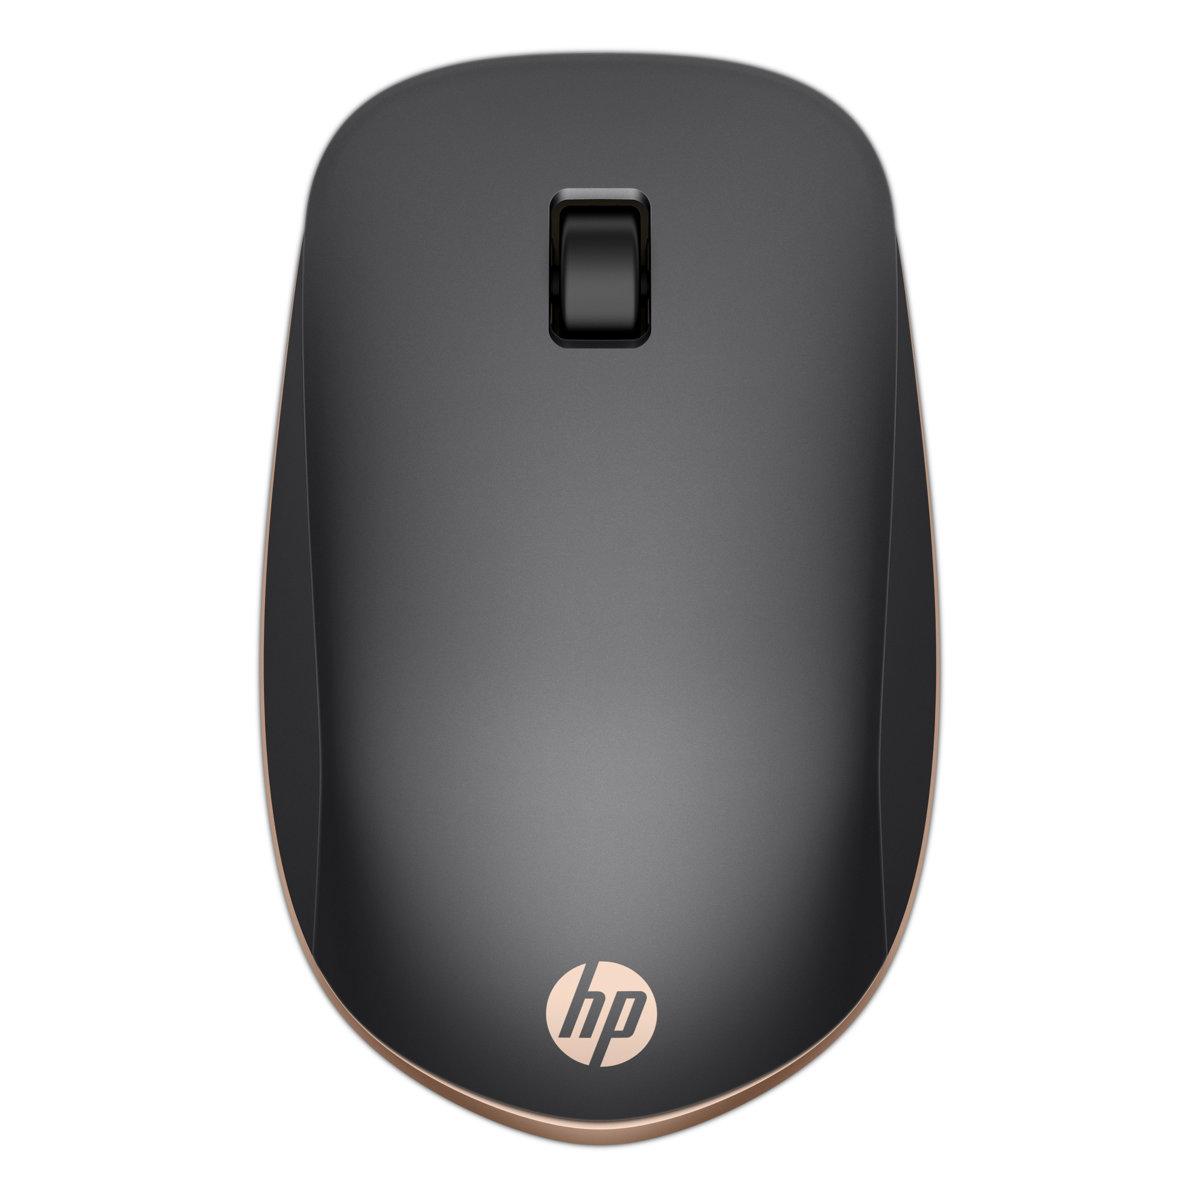 HP Z5000 - mus - Bluetooth - matt finish i - Mouse - 3 knappar - Svart ac670f23184ea